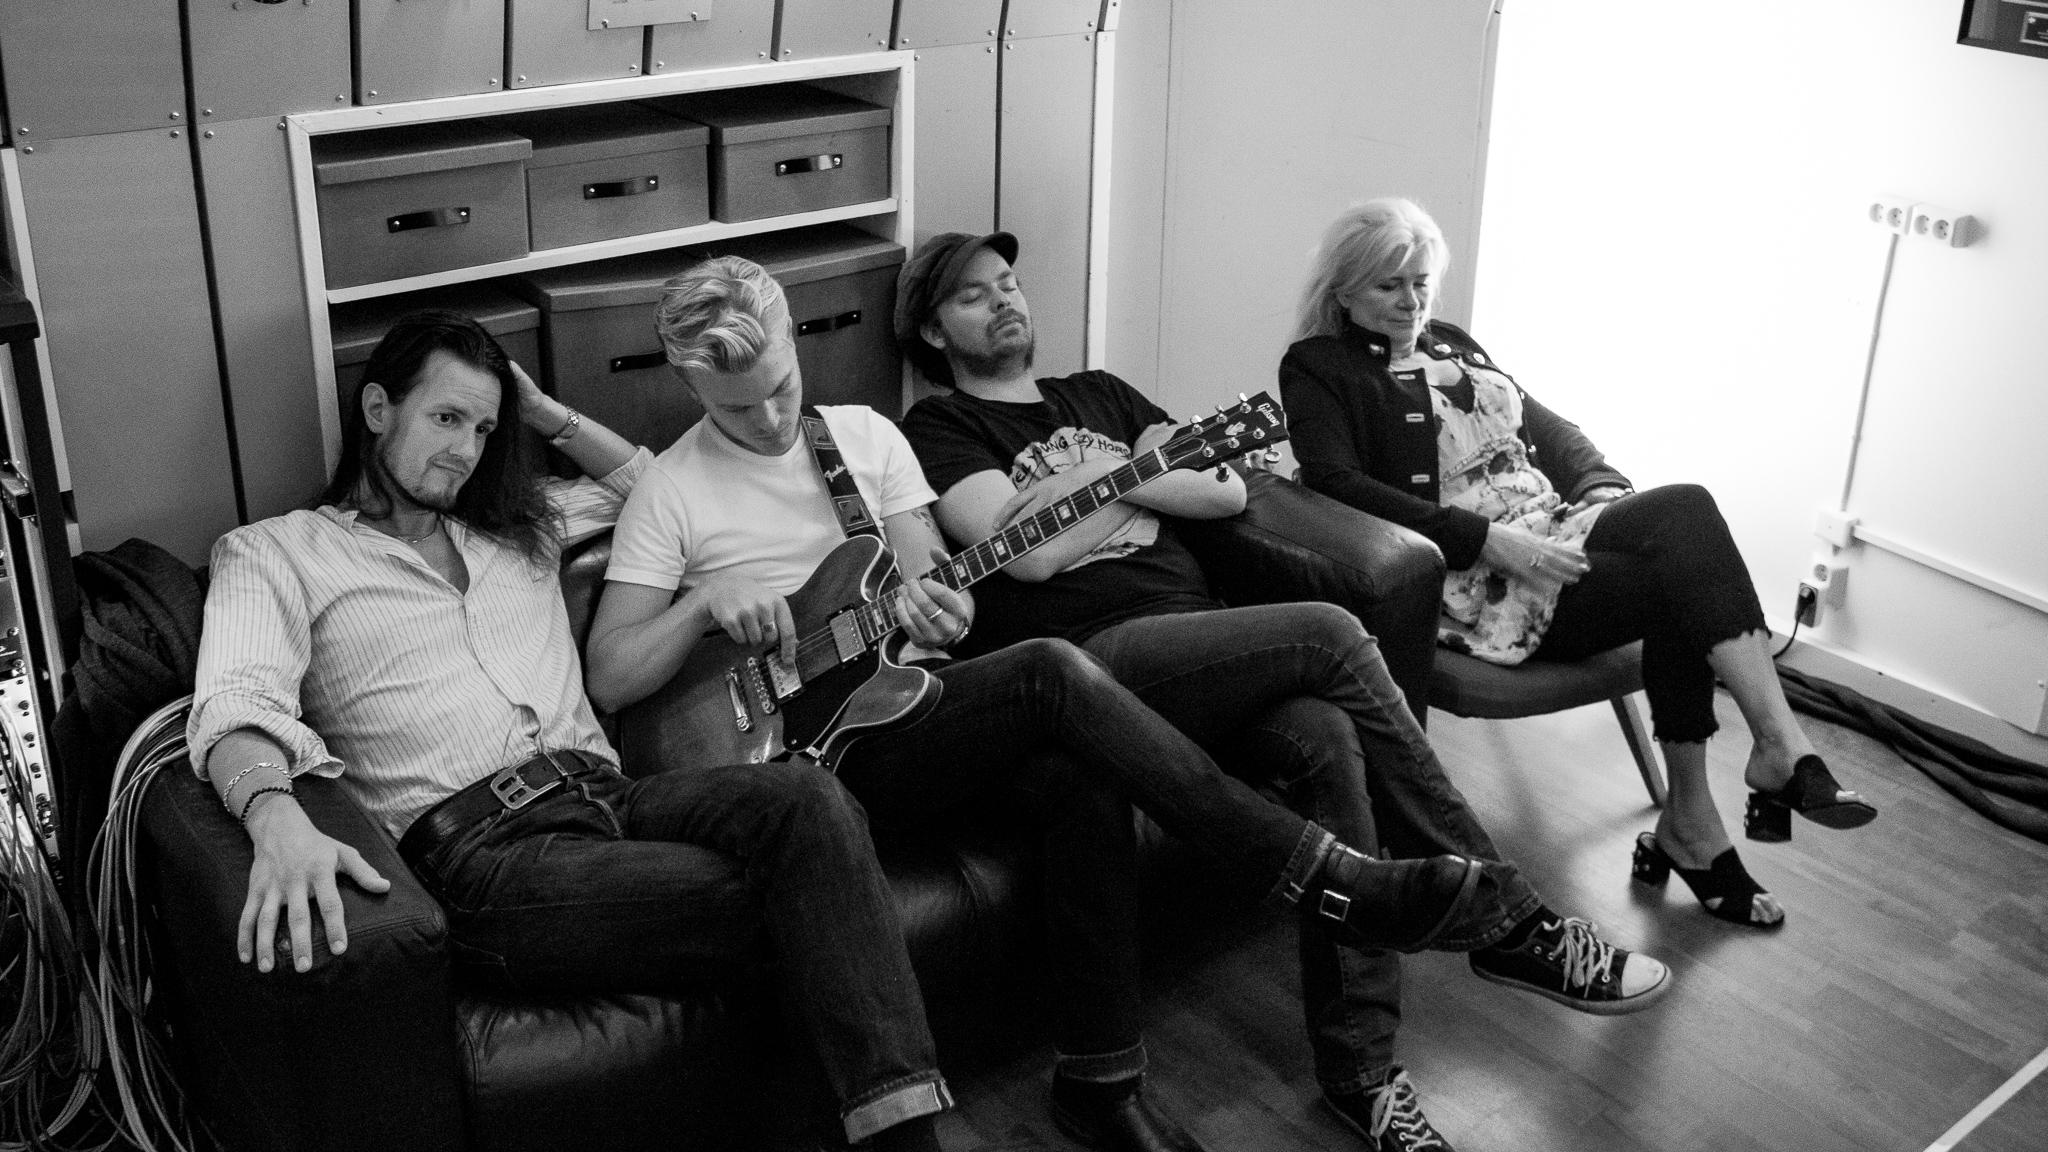 Boiling Blues Band: Ola Göransson, Johan Östergård, Morgan Korsmoe and Annika Andersson